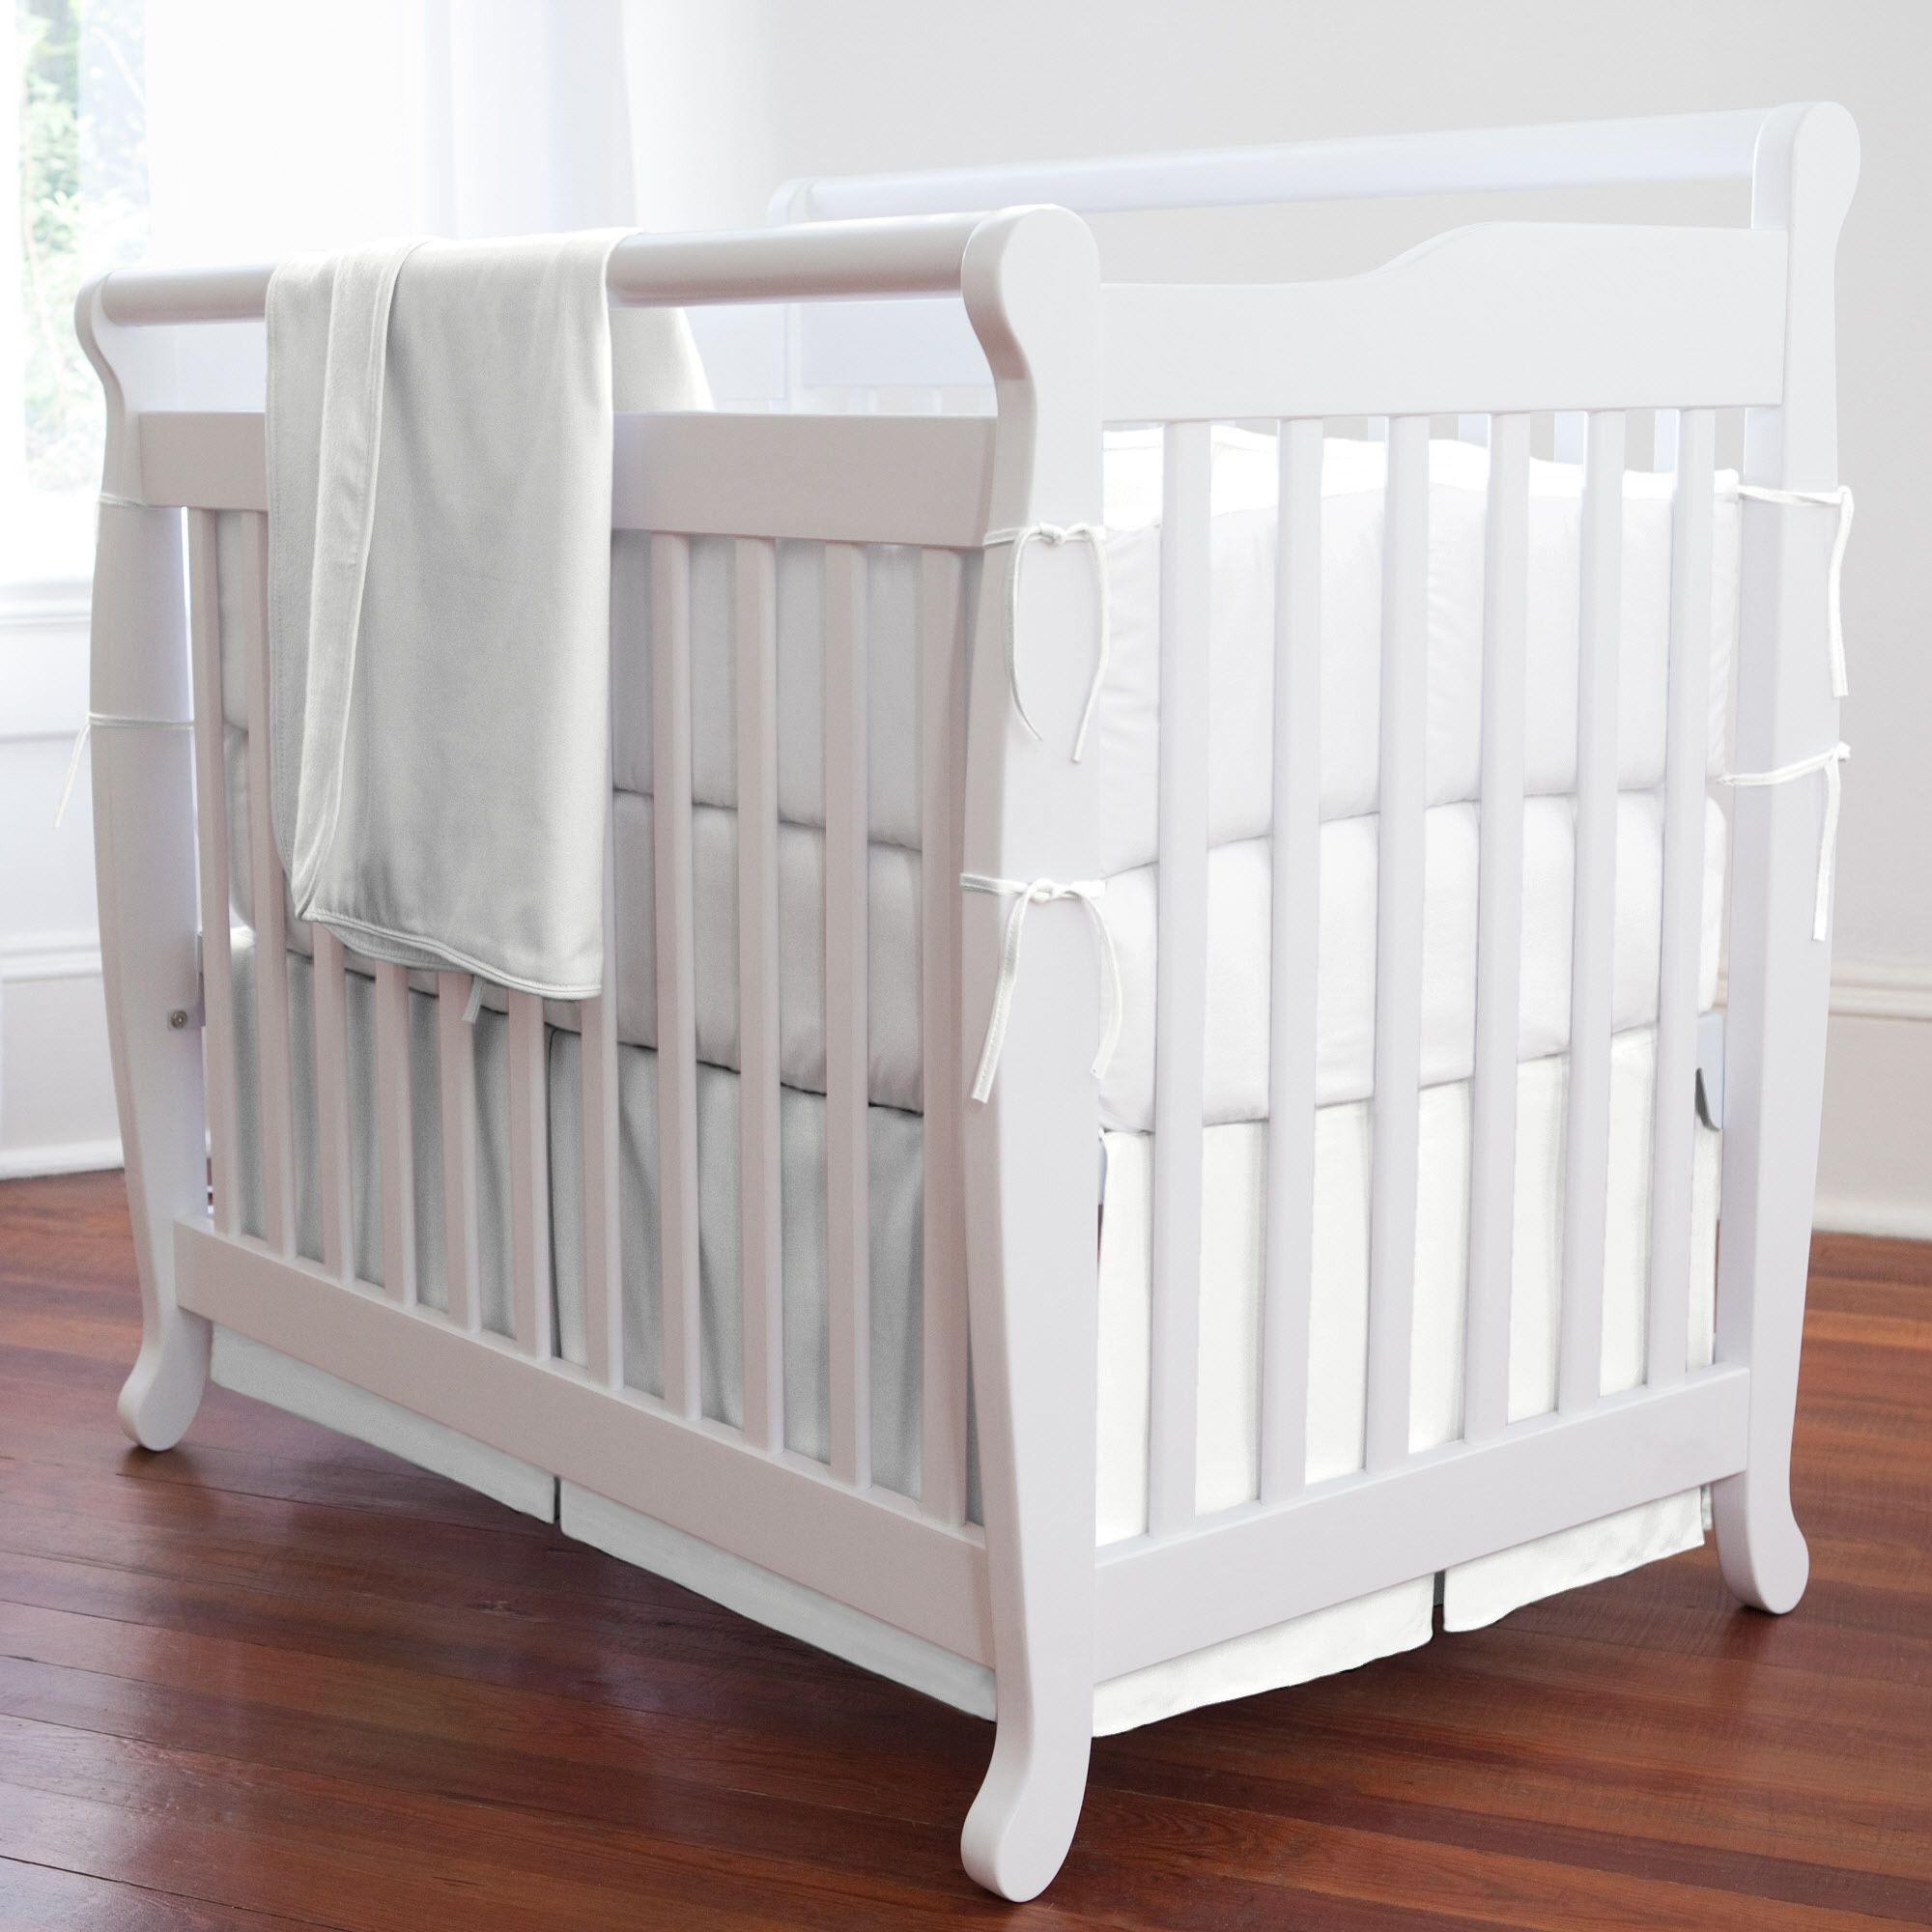 Solid White Mini Crib Bedding Portable crib bedding